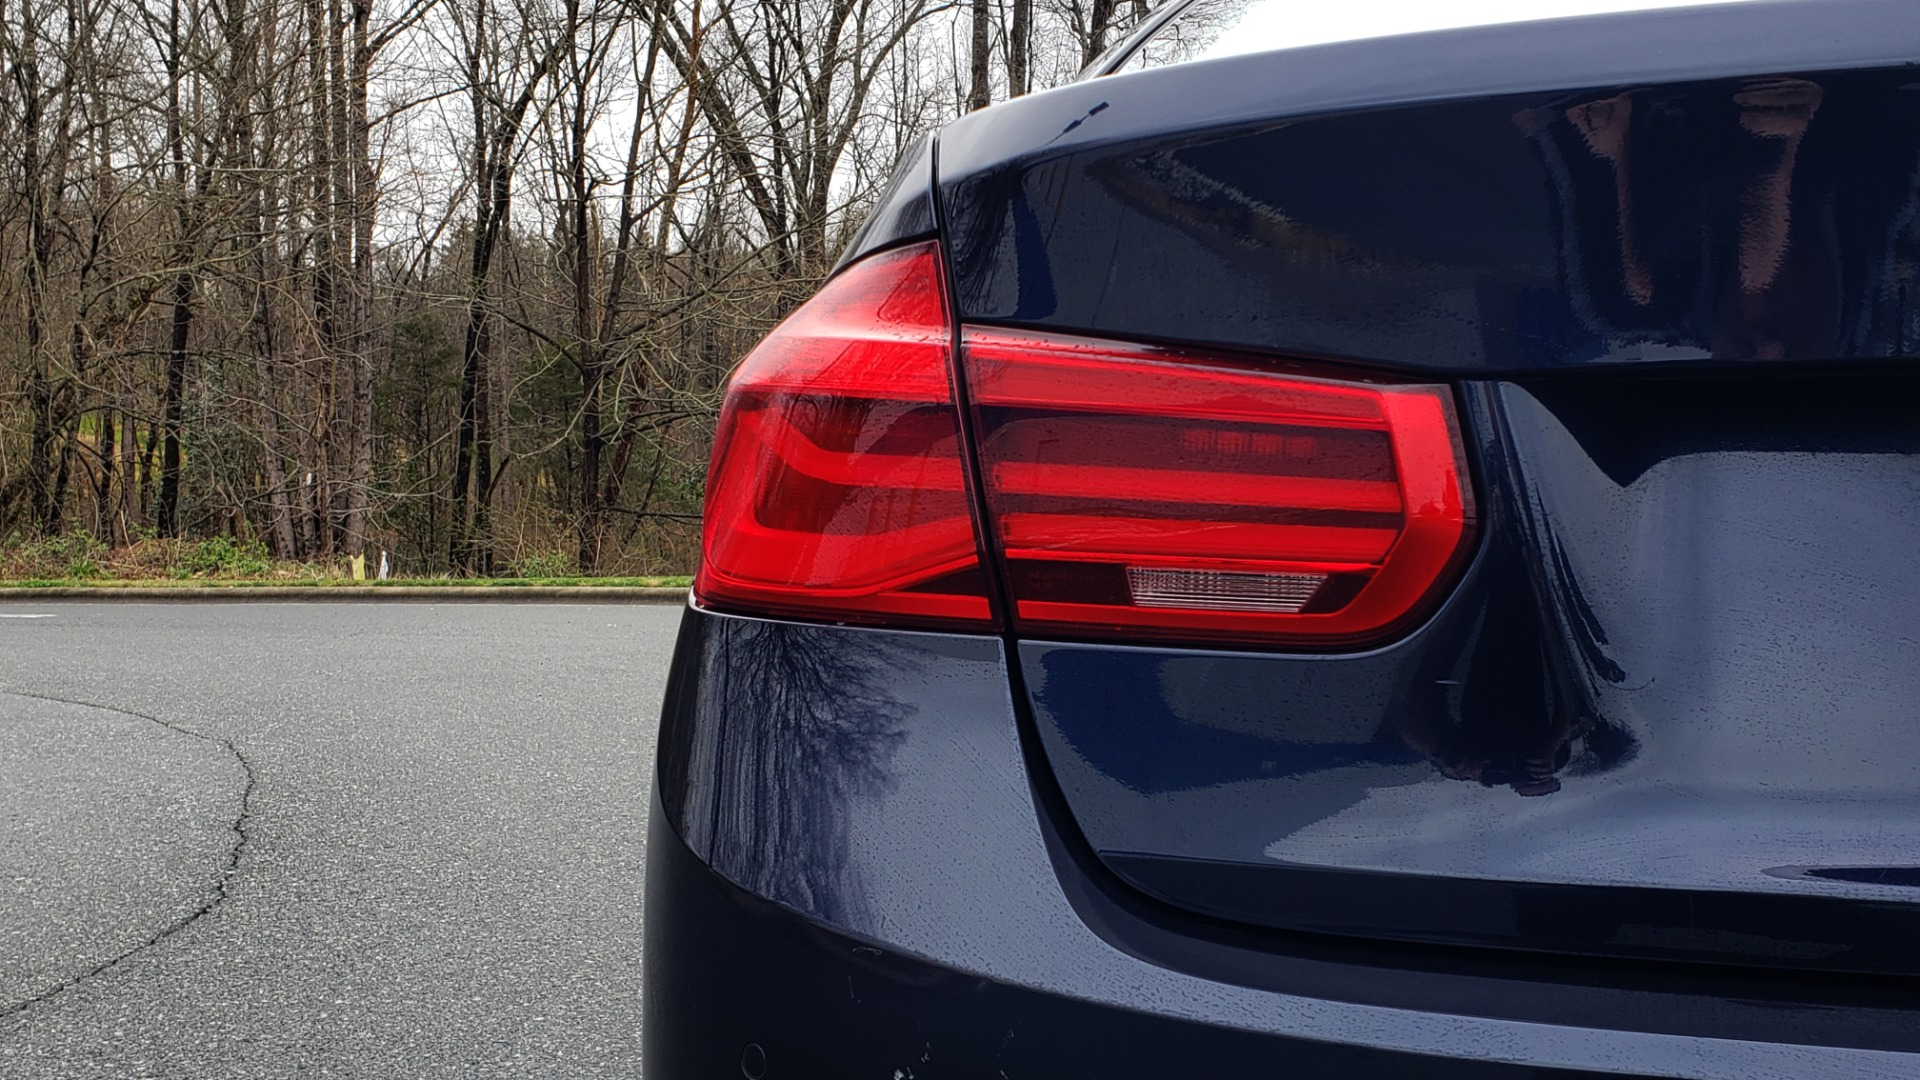 Used 2016 BMW 3 SERIES 328I PREMIUM PKG / DRVR ASST / SUNROOF / PARK ASST for sale Sold at Formula Imports in Charlotte NC 28227 27